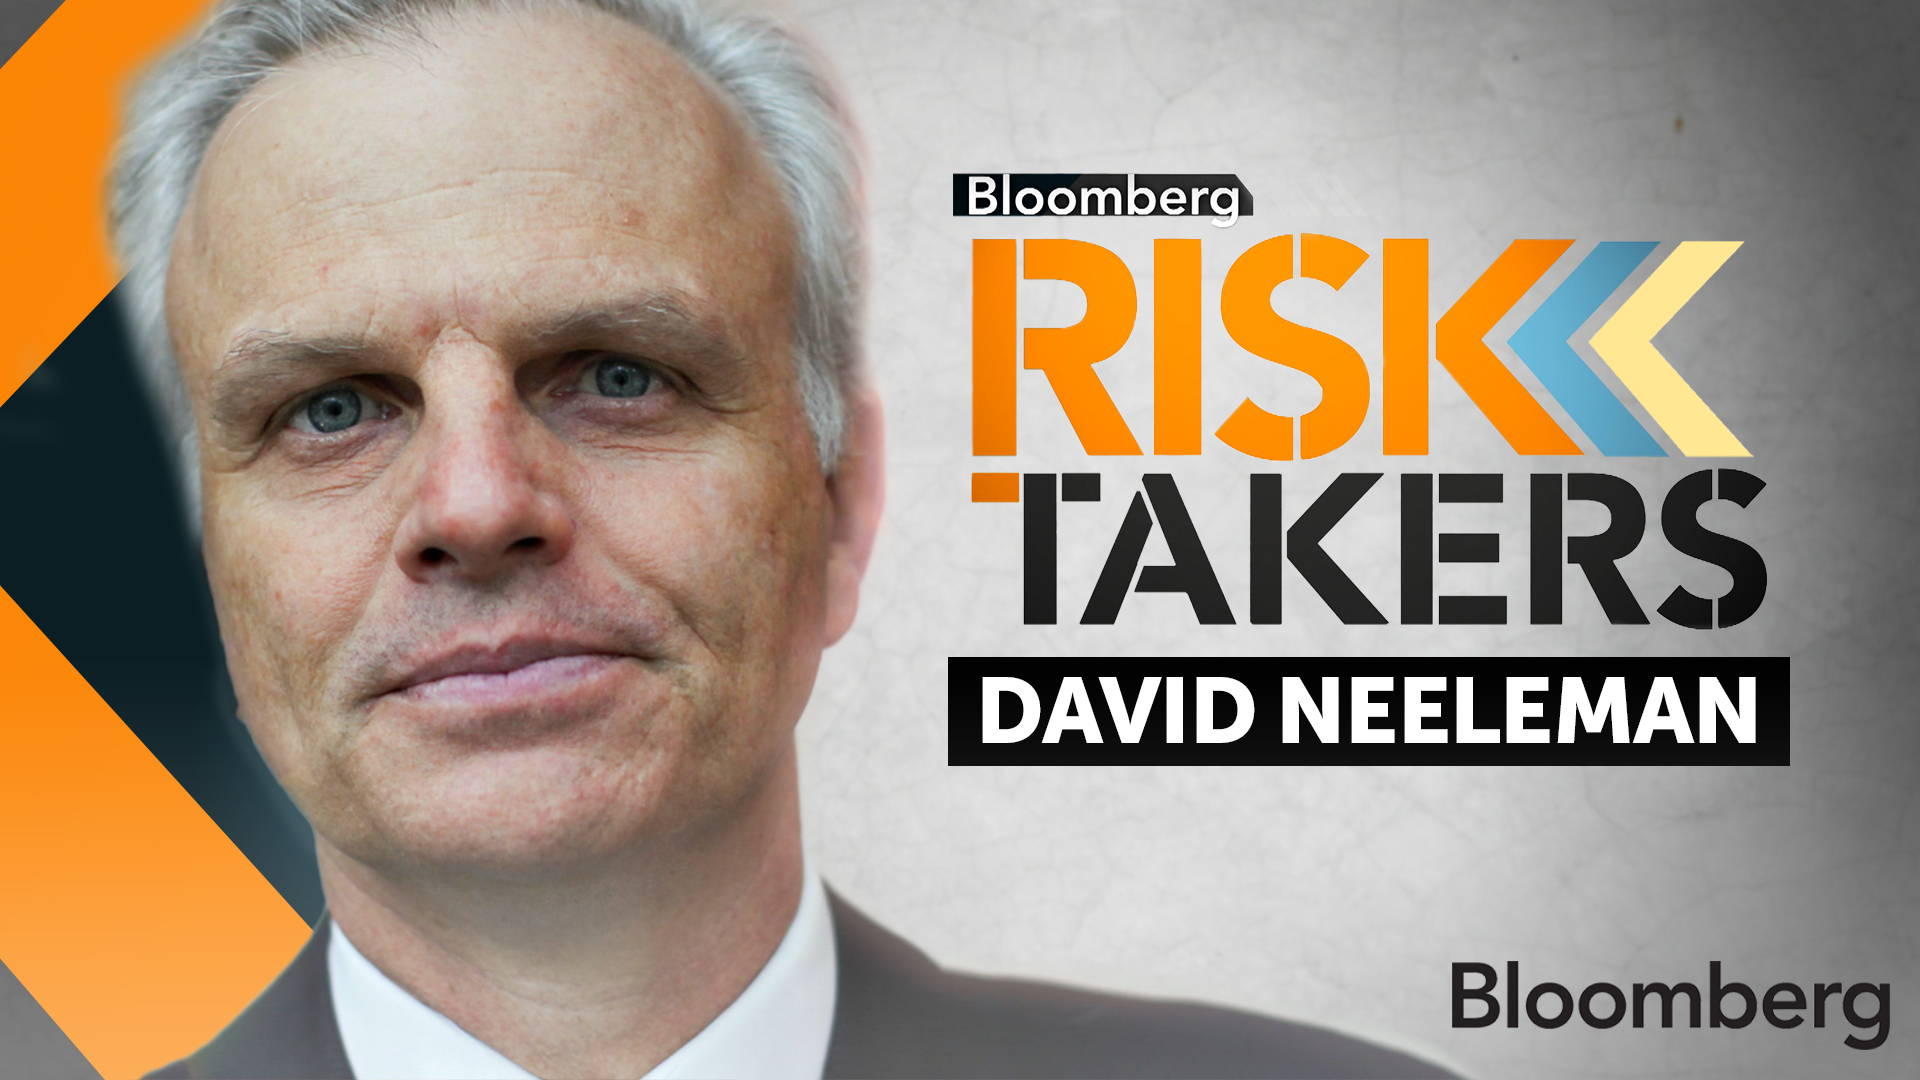 Risk Takers: David Neeleman - Bloomberg